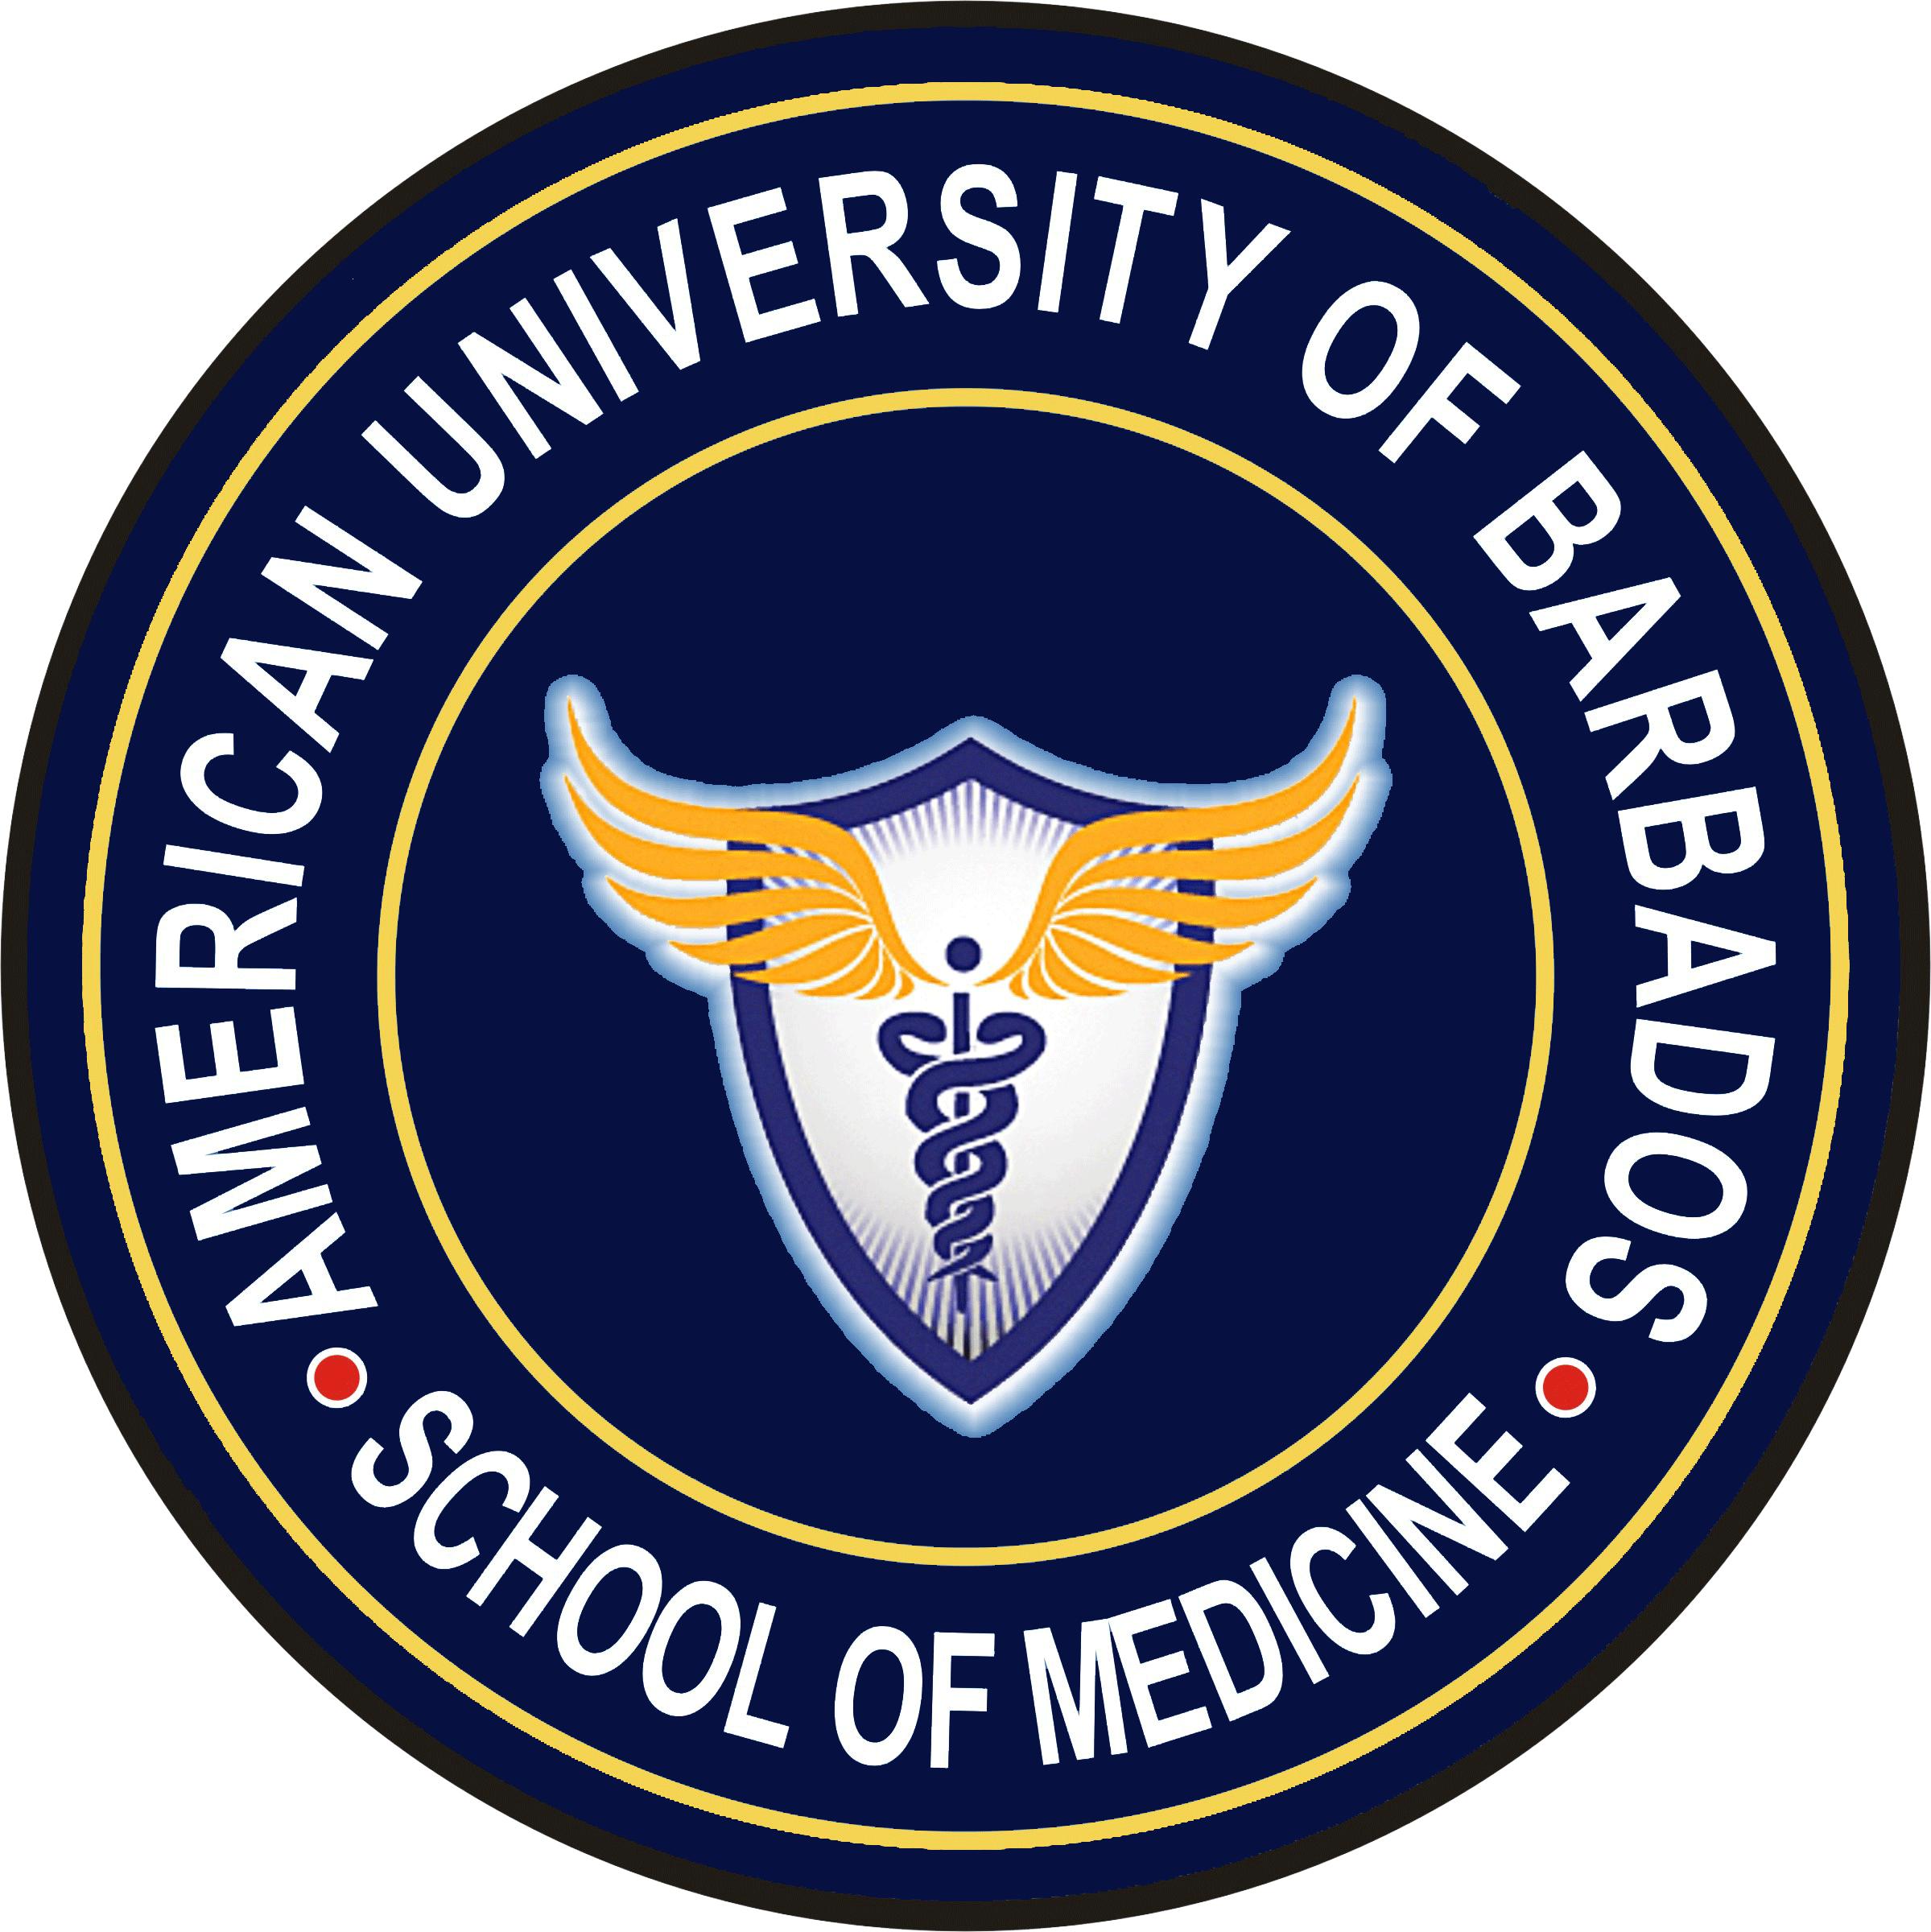 Download American University Of Barbados Leeds United Old Badge Full Size Png Image Pngkit